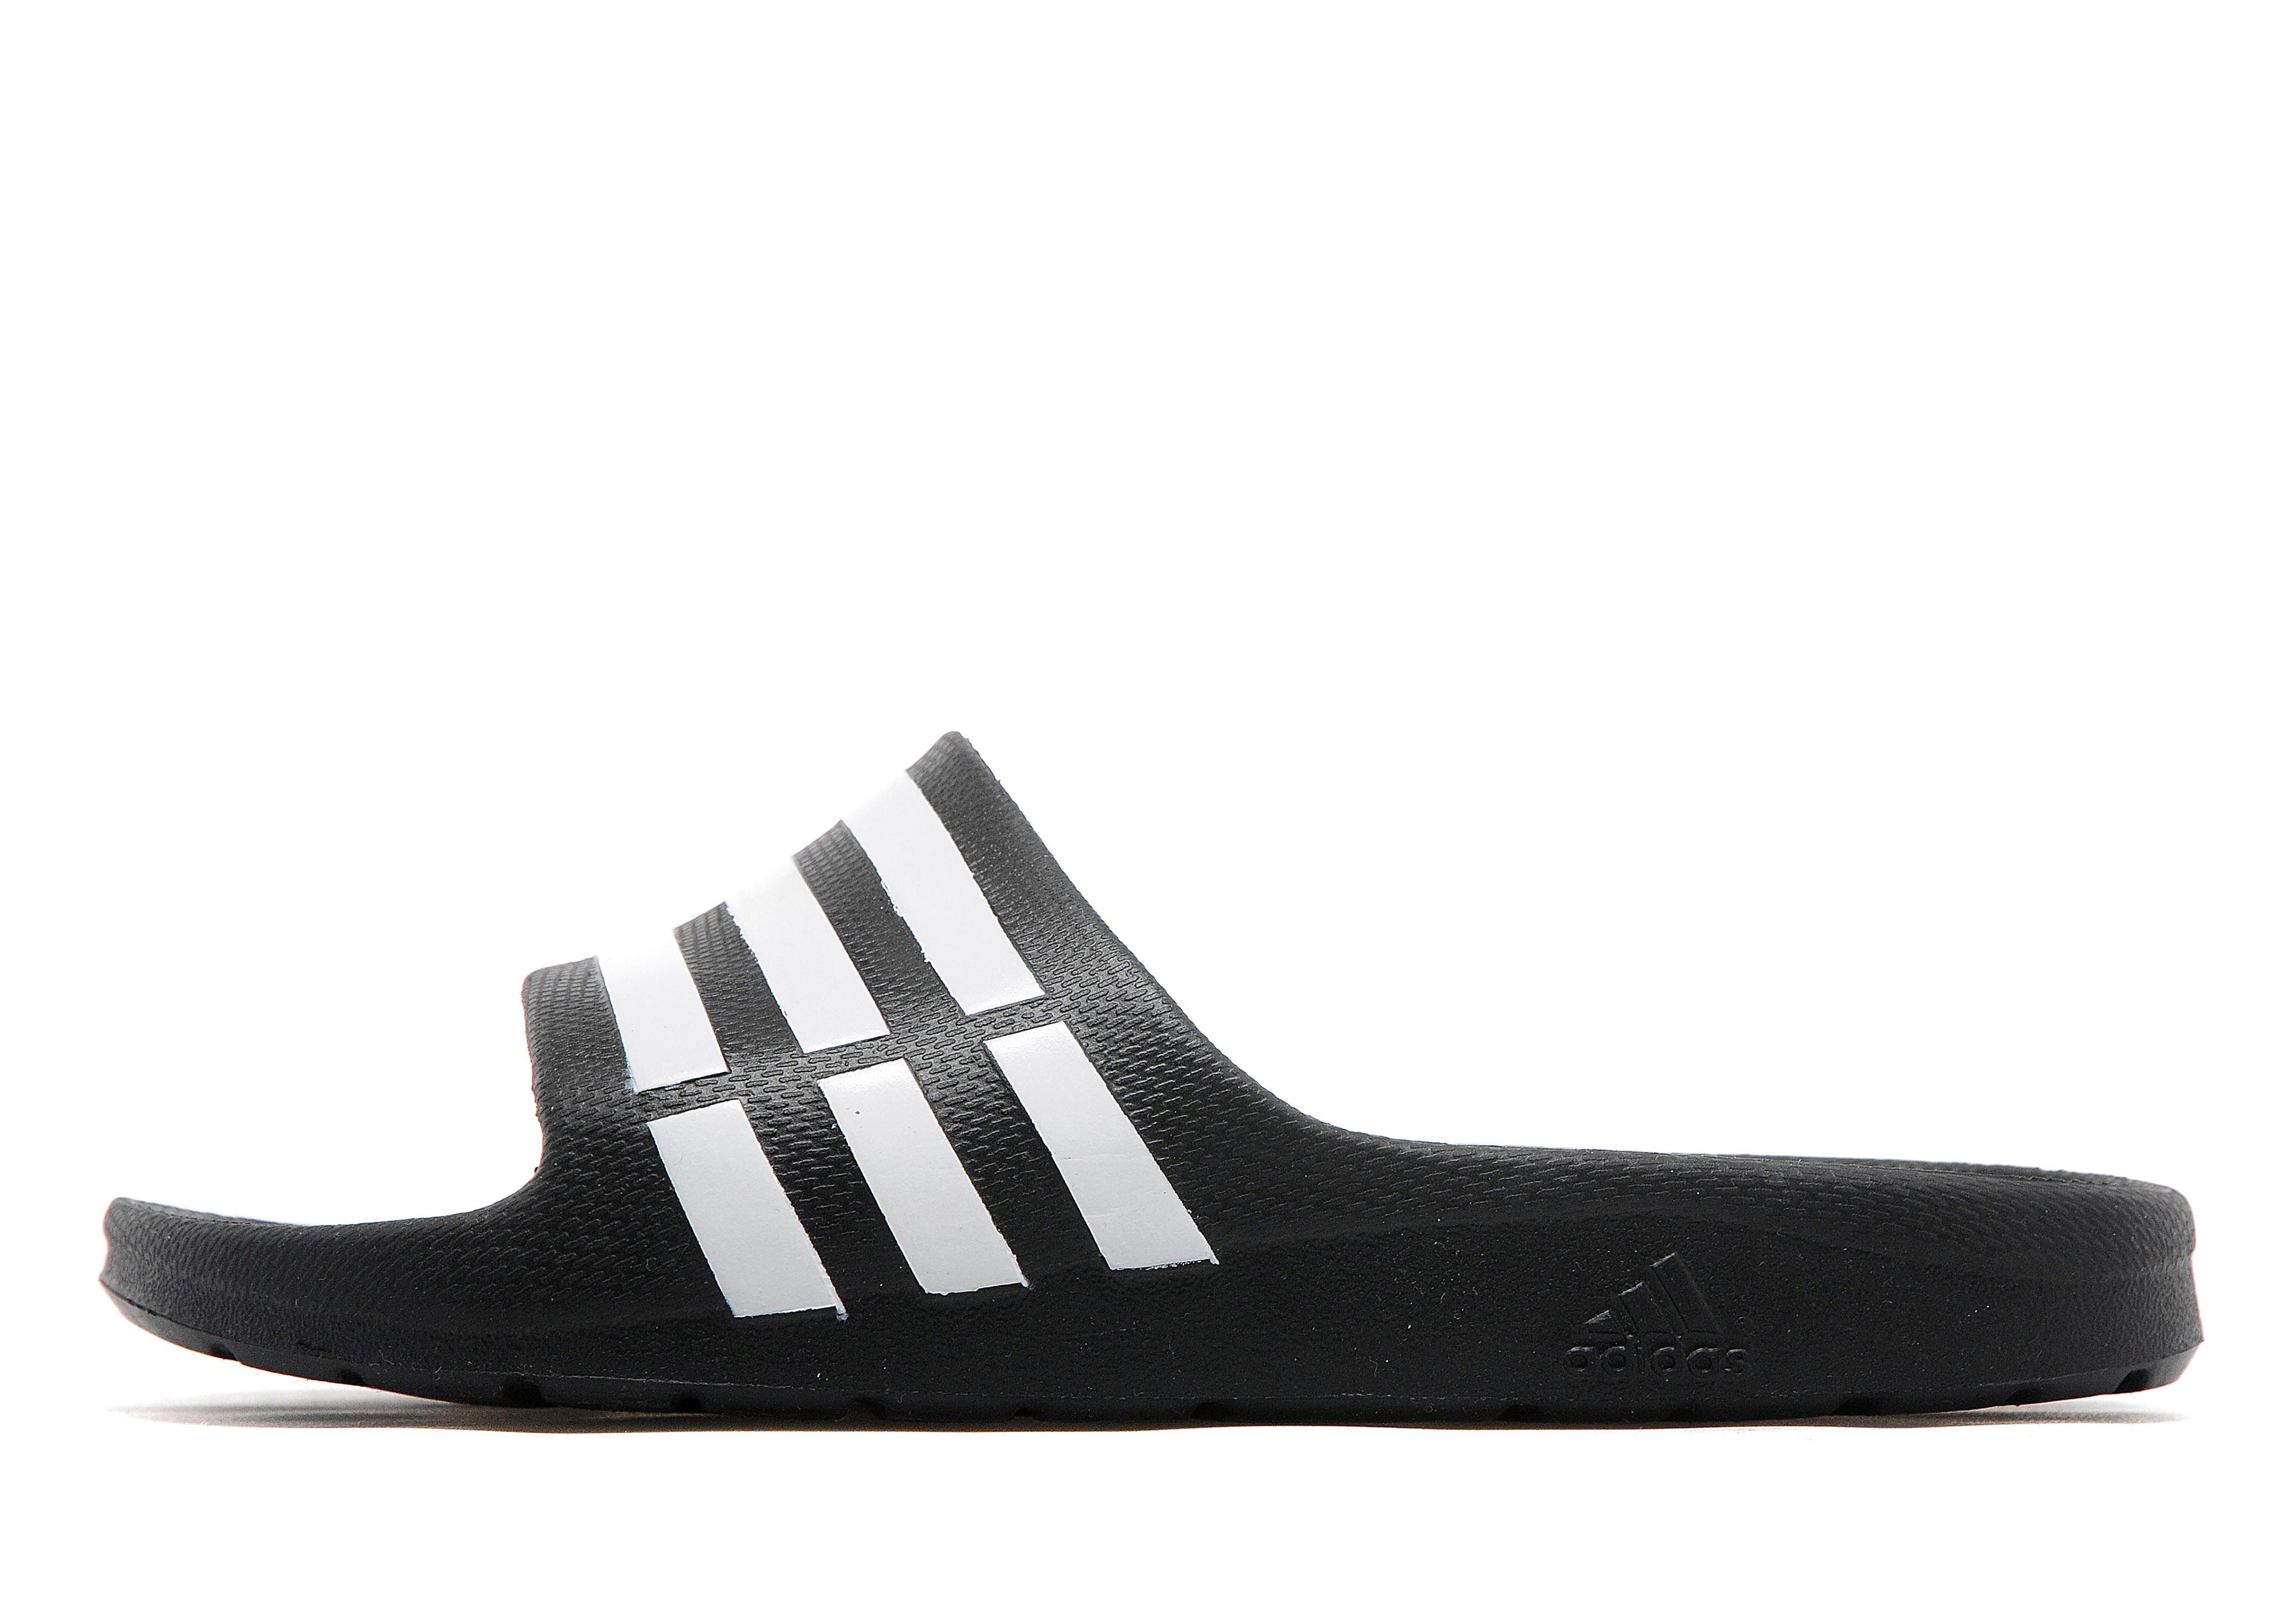 adidas Sandales Duramo